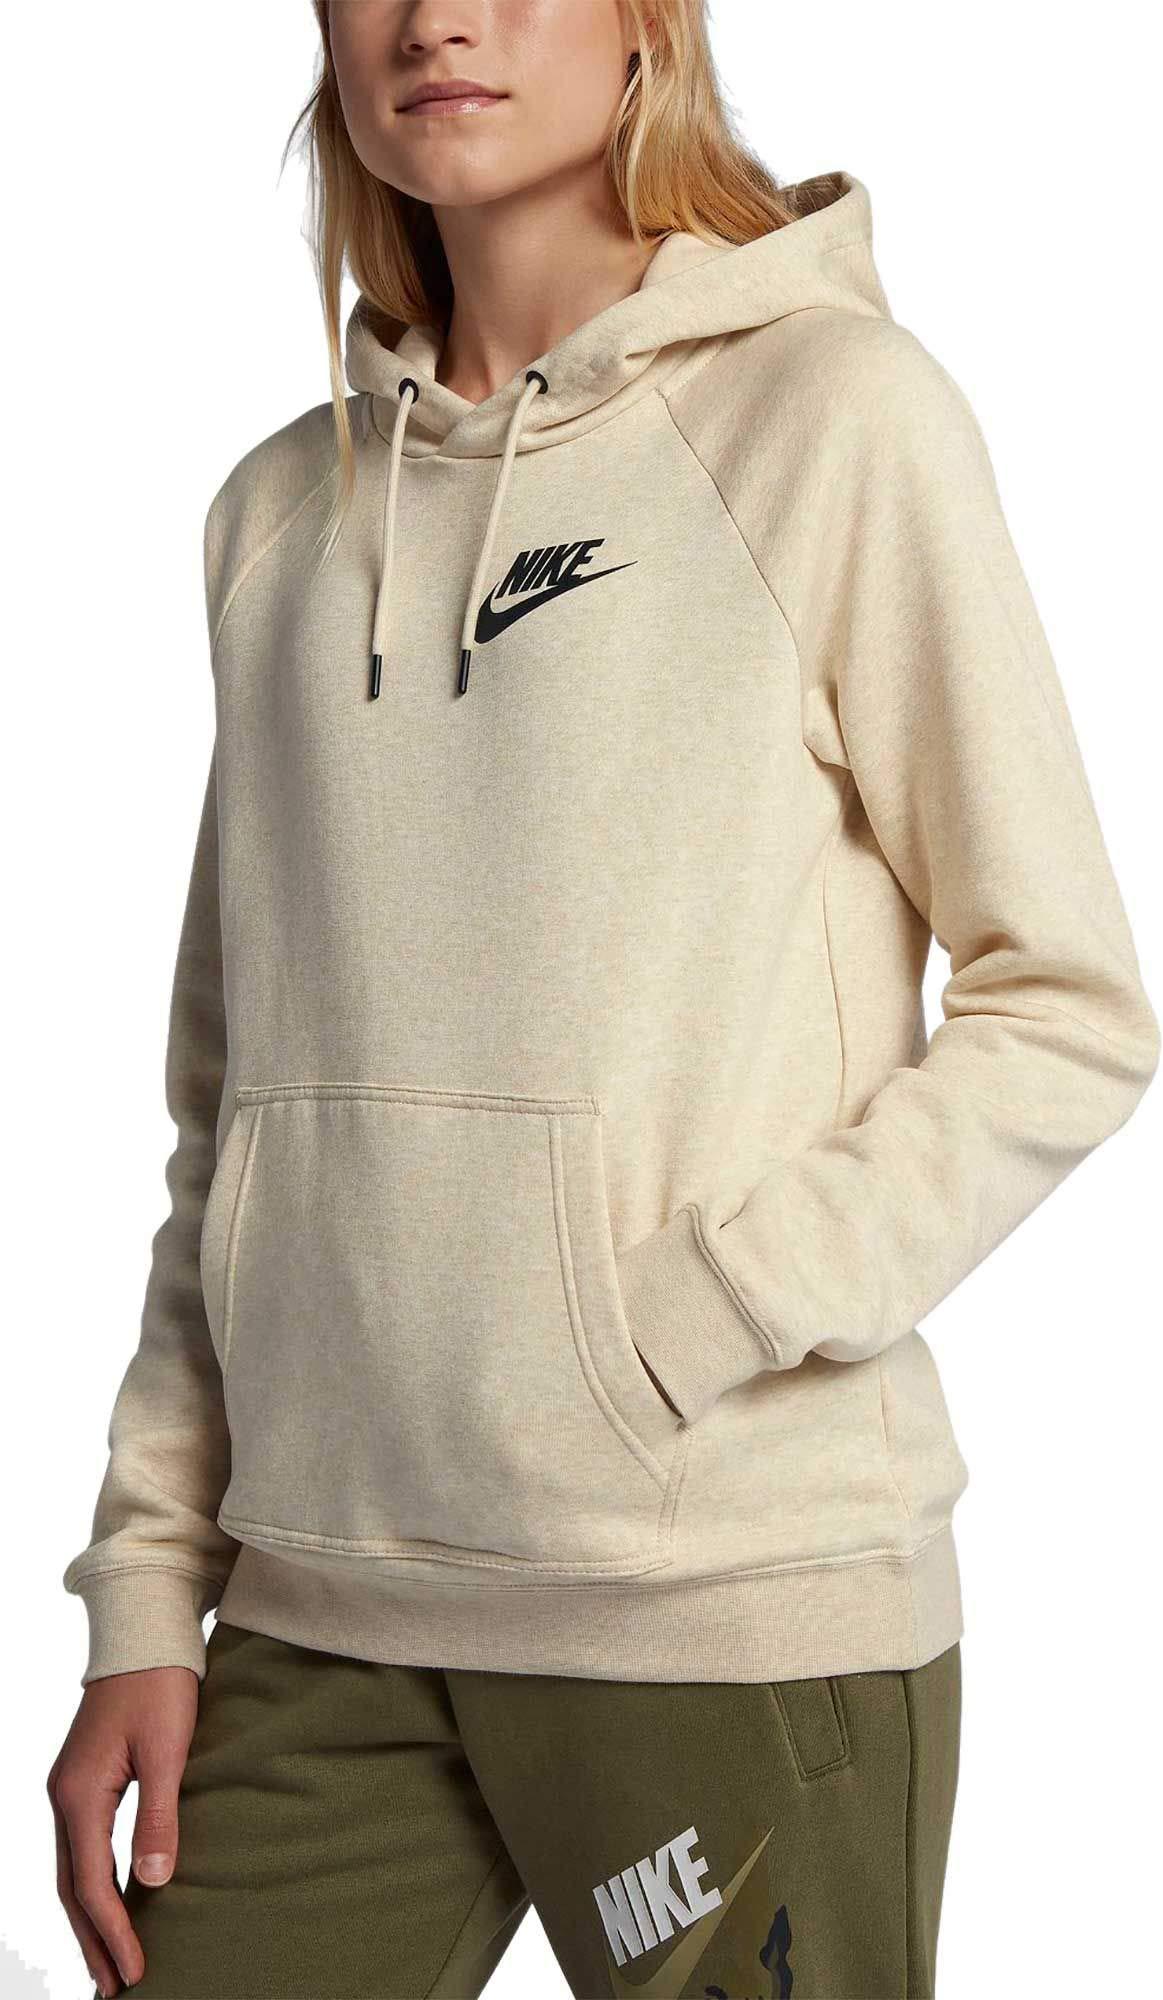 Nike Womens Sportswear Rally Hoodie (Light Cream/Small)